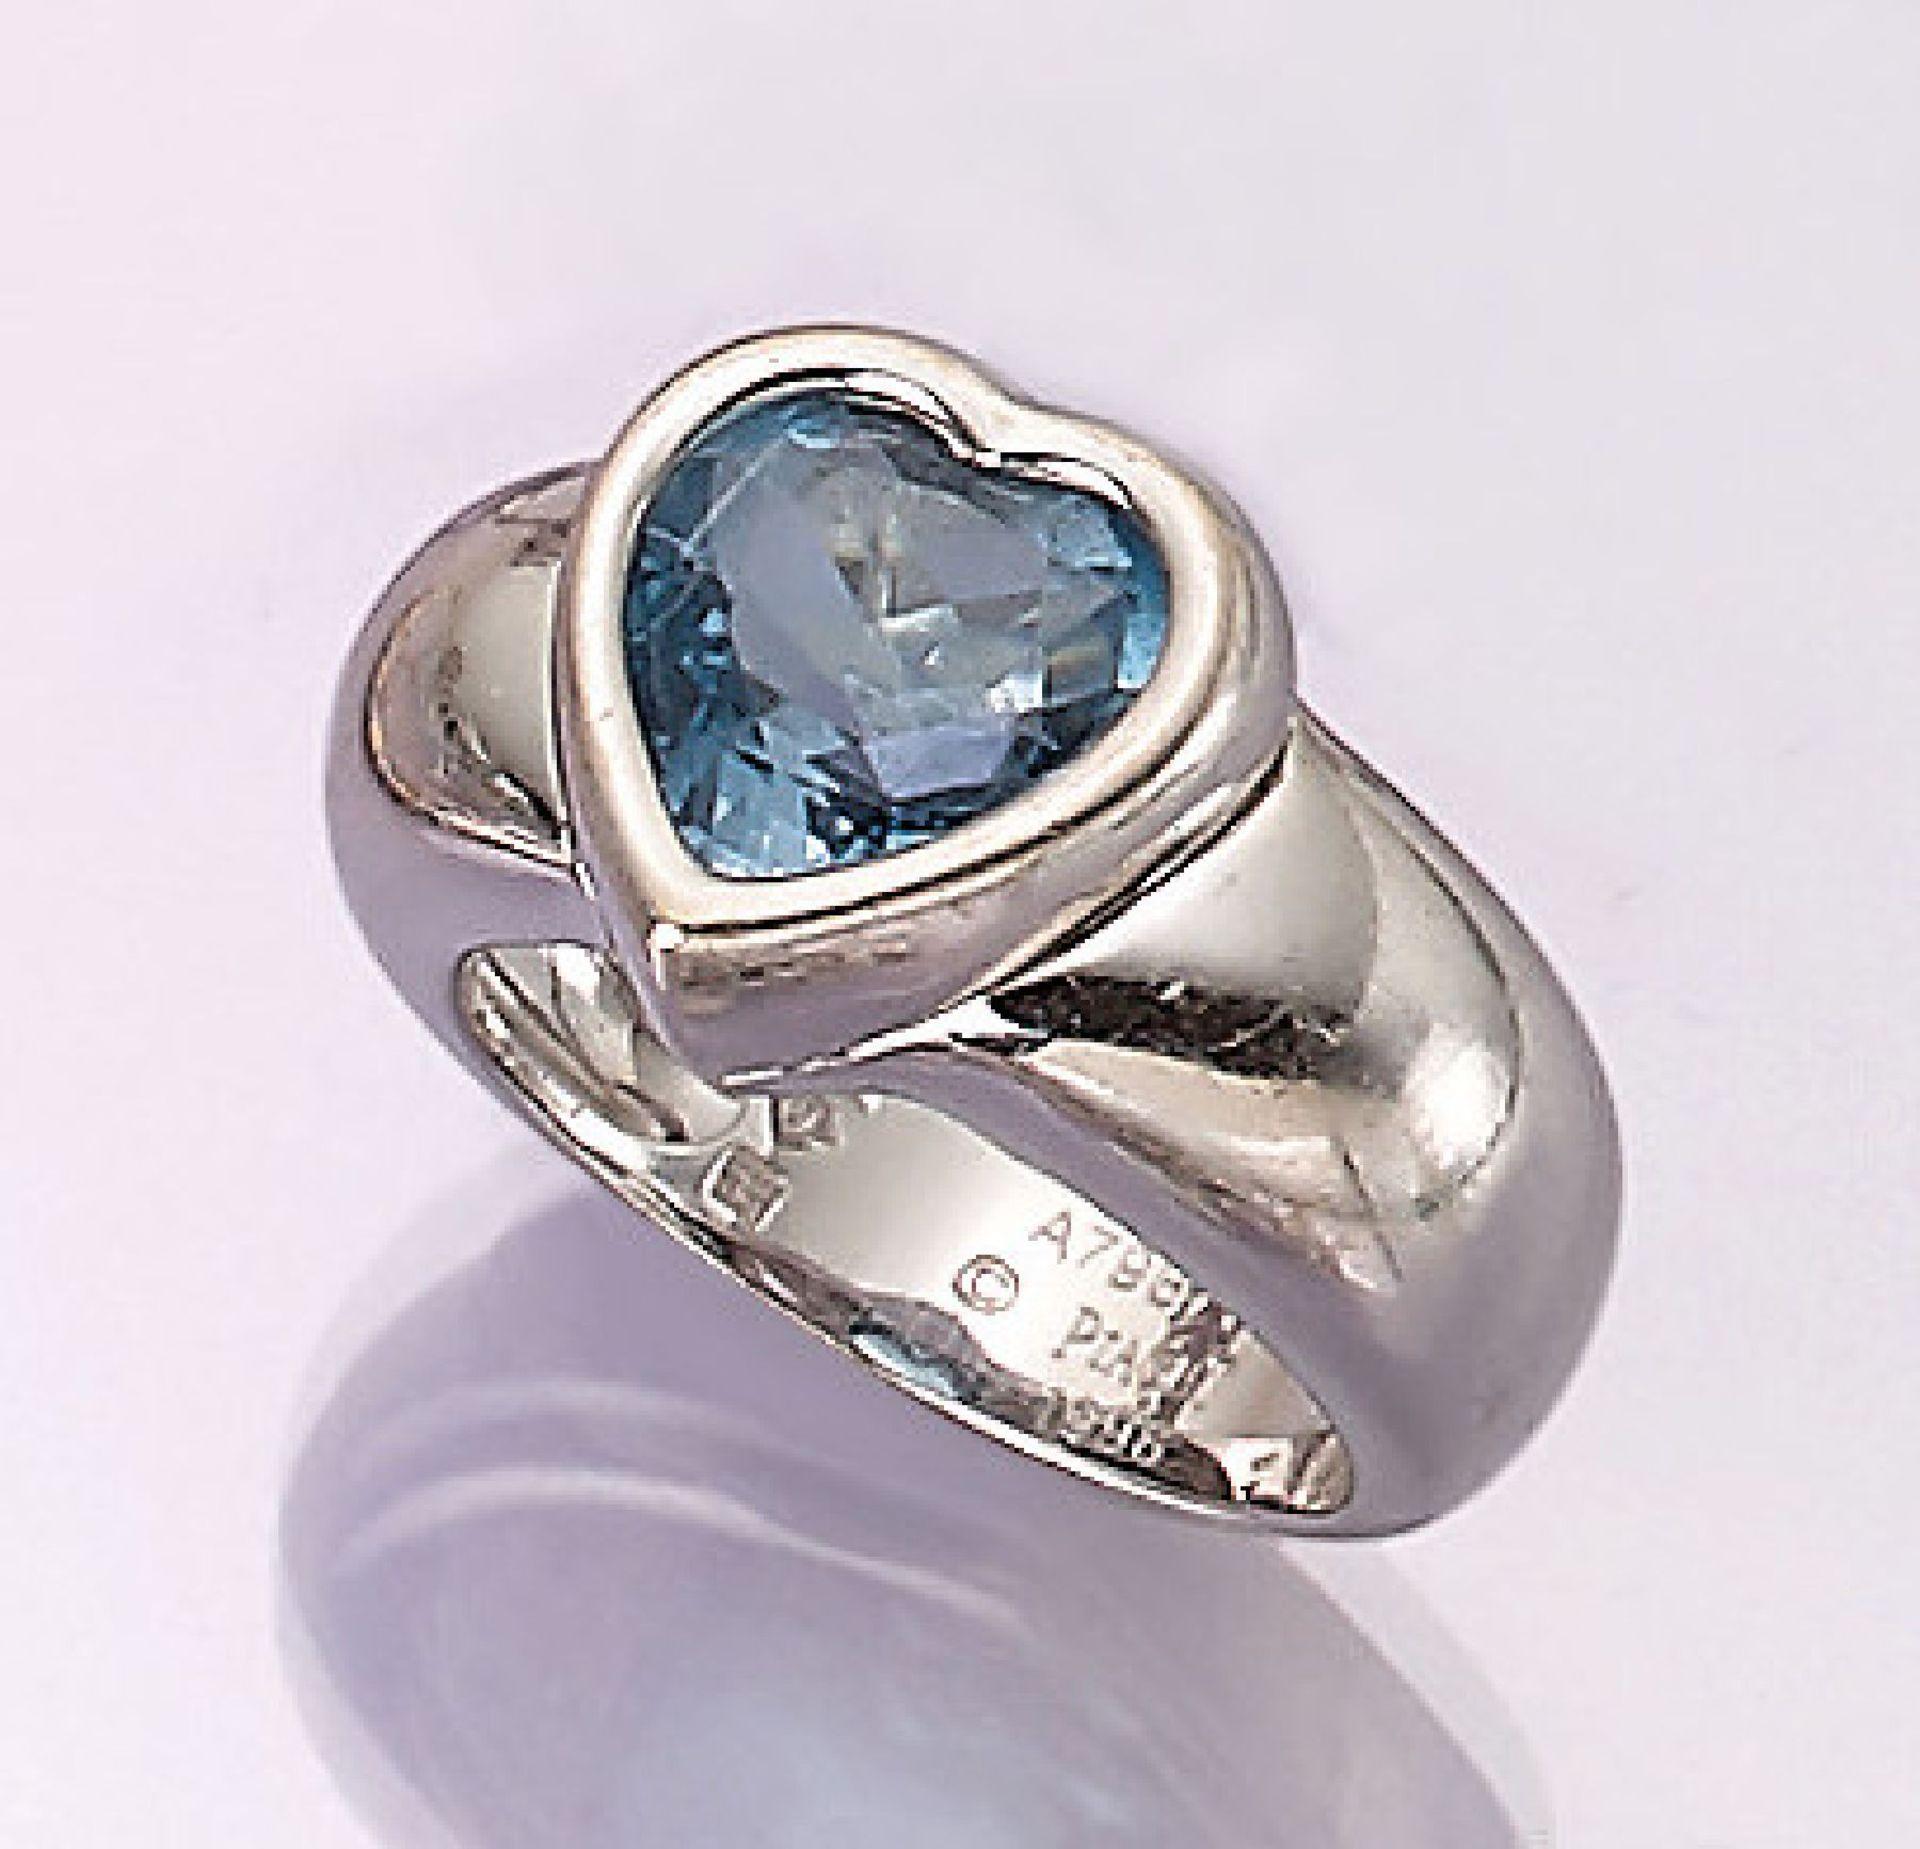 Los 31552 - 18 kt gold PIAGET ring with topaz , WG 750/000, bevelled blue topaz heart (treated), splint heart